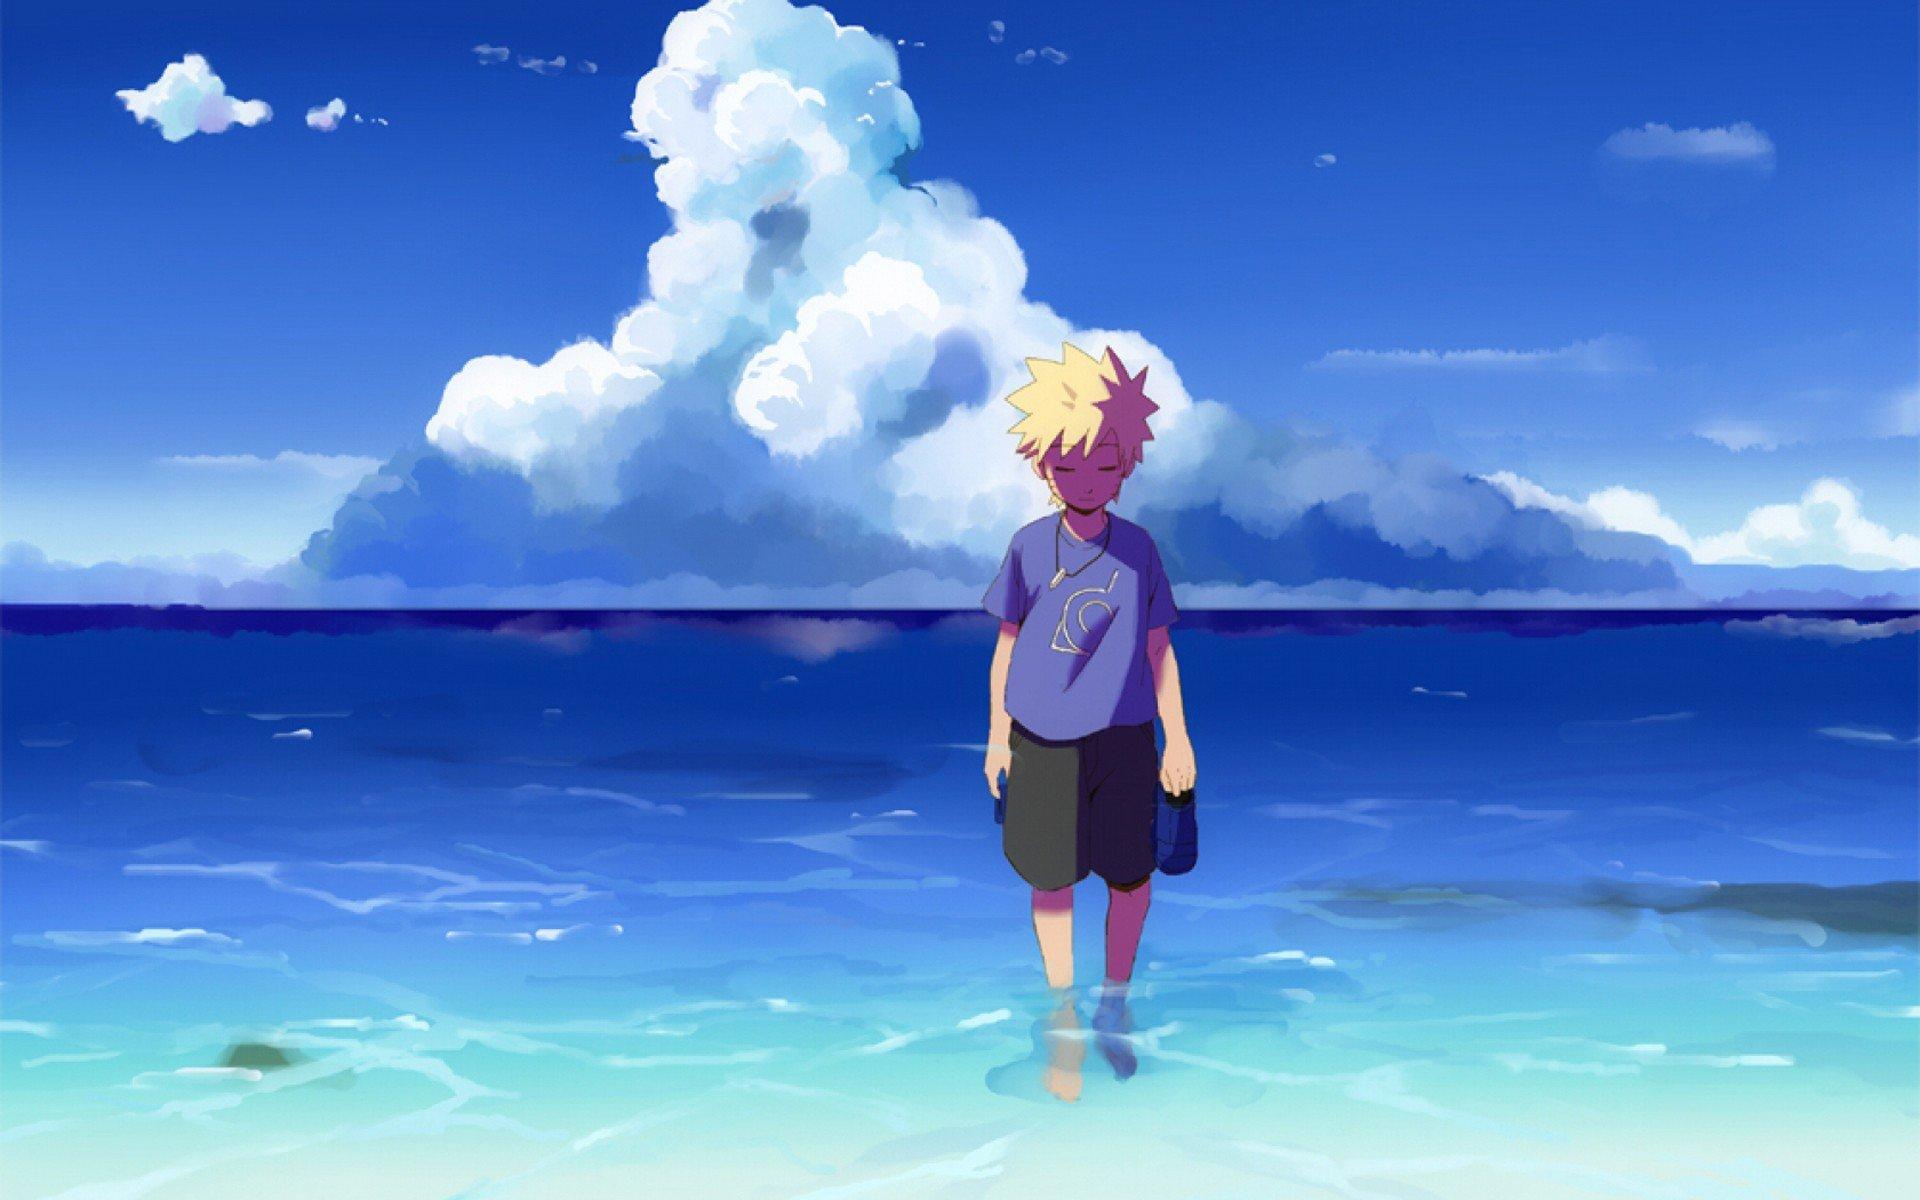 1920x1200 Px Anime Beach Digital Art Landscape Masashi Kishimoto Naruto Shippuuden Uzumaki Water